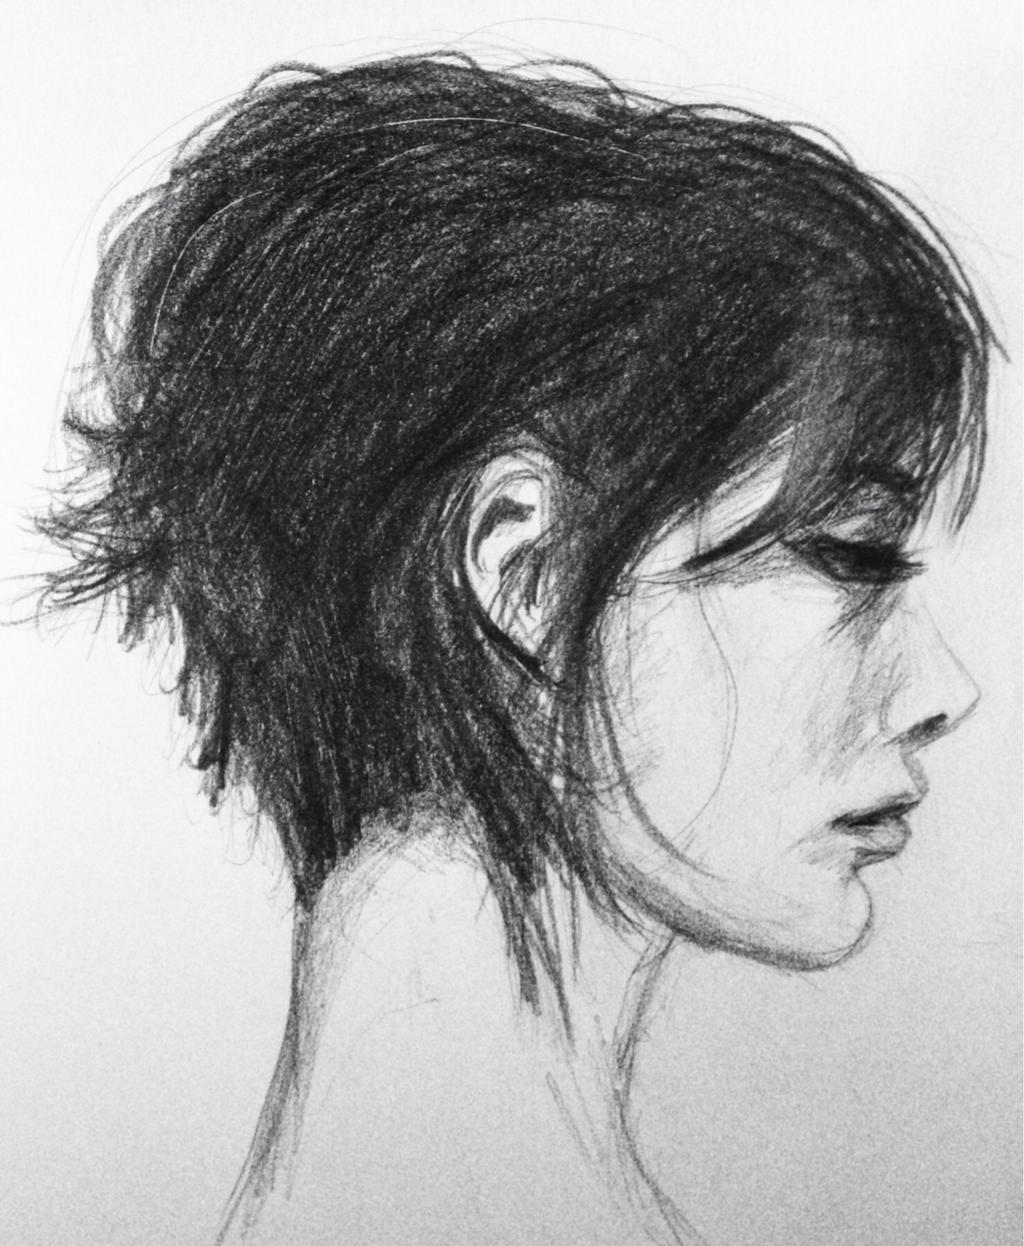 Side Portrait of a Woman by Adonenniel on DeviantArt Woman Side Profile Drawing